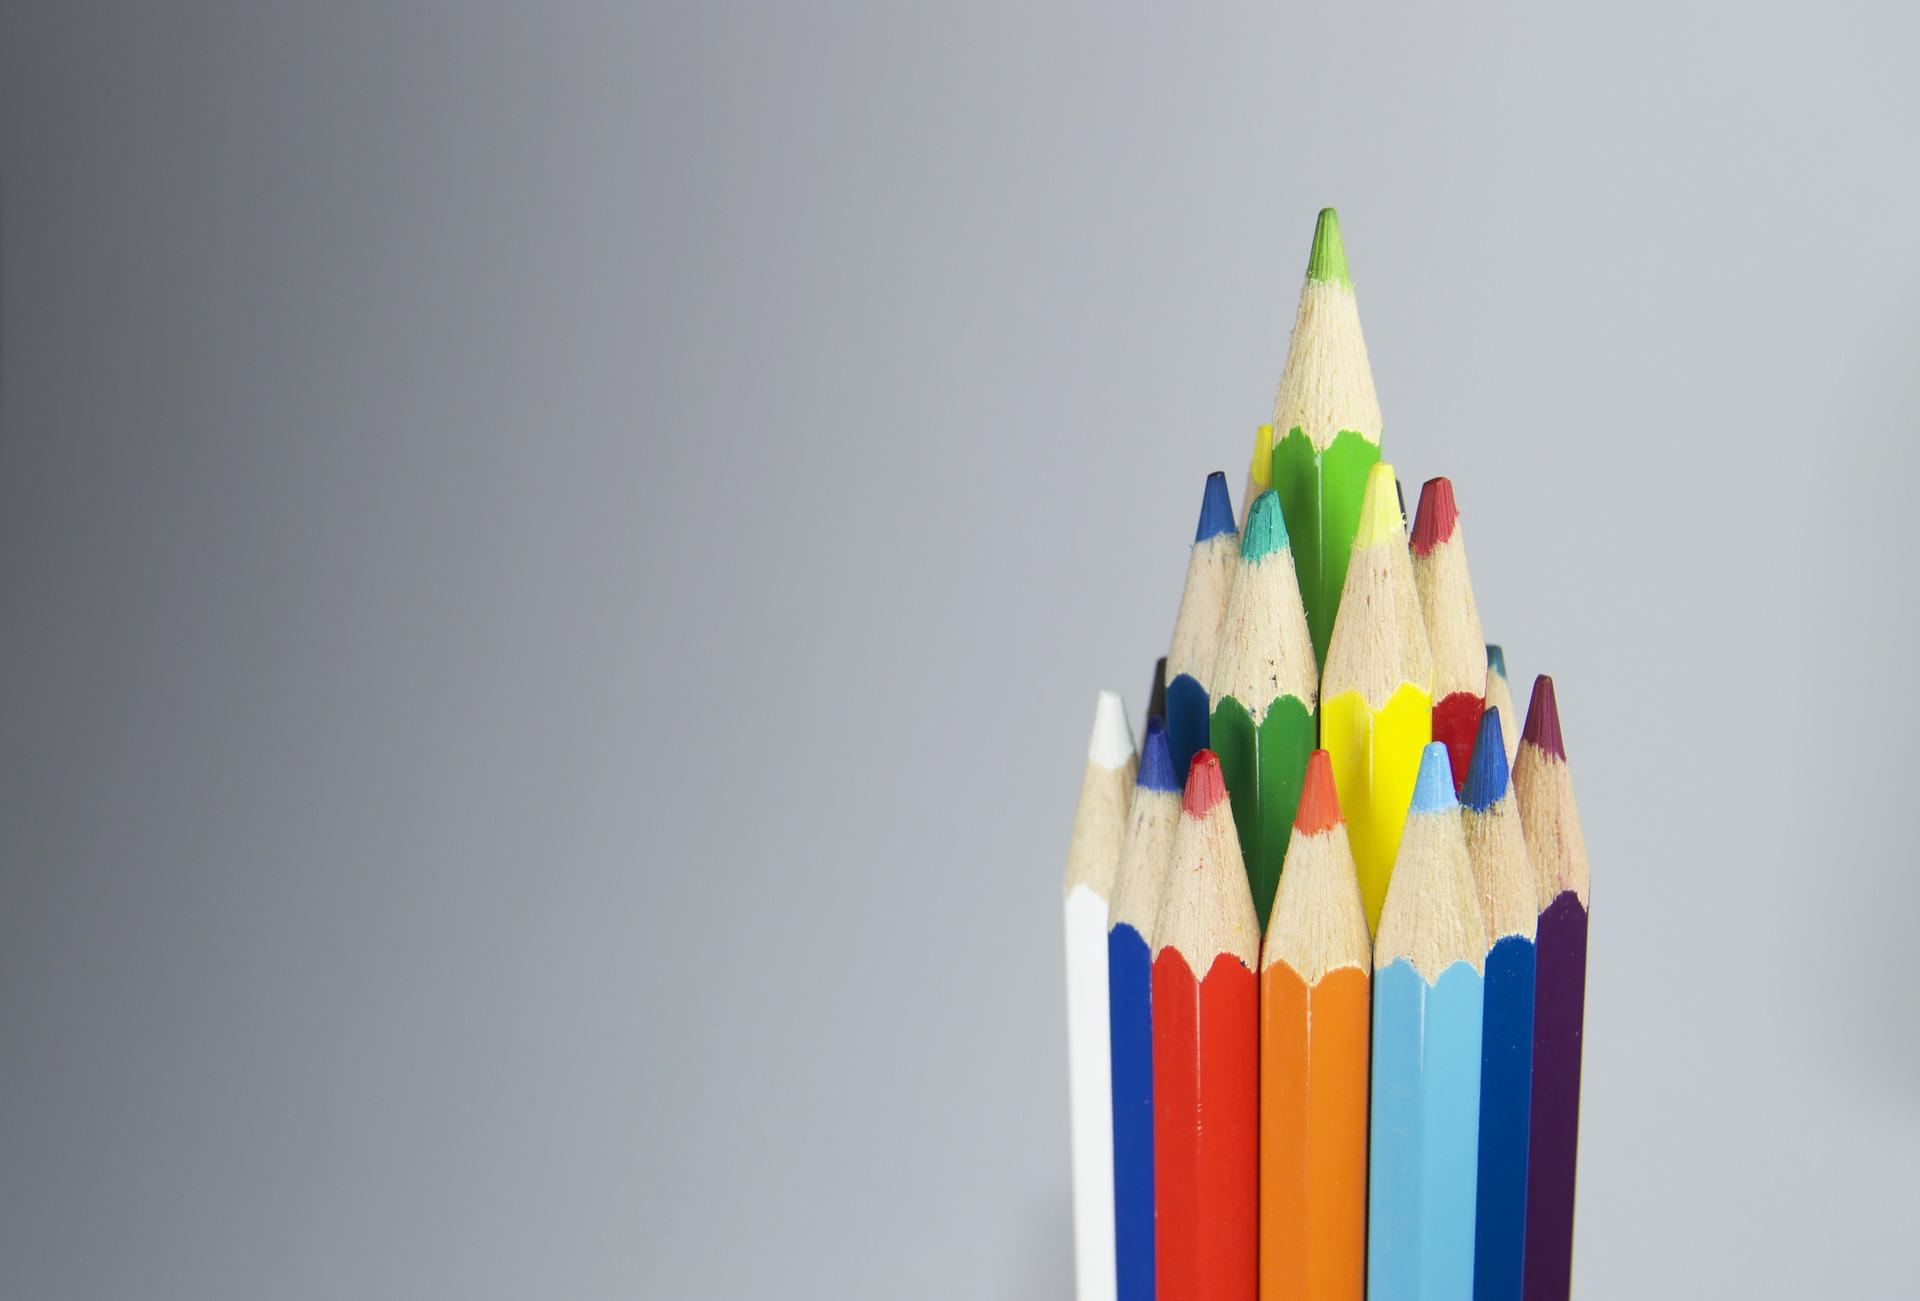 Bleistifte, Holz, Farben, Pyramide, Schwelle - Wallpaper HD - Prof.-falken.com